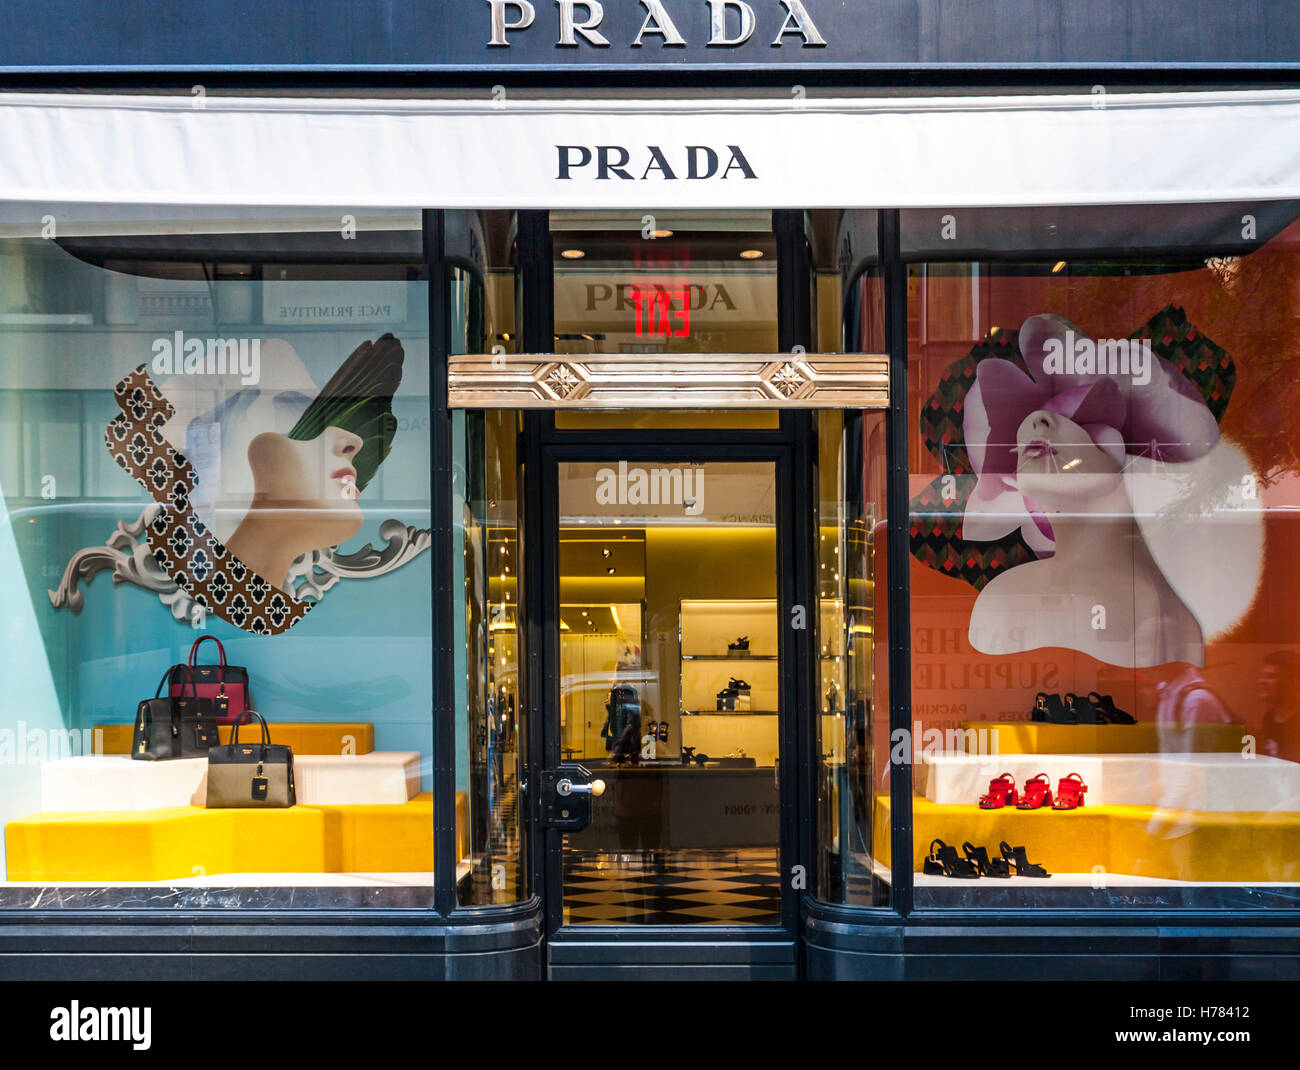 Prada Store New York Photos   Prada Store New York Images - Alamy acc9129b8f3